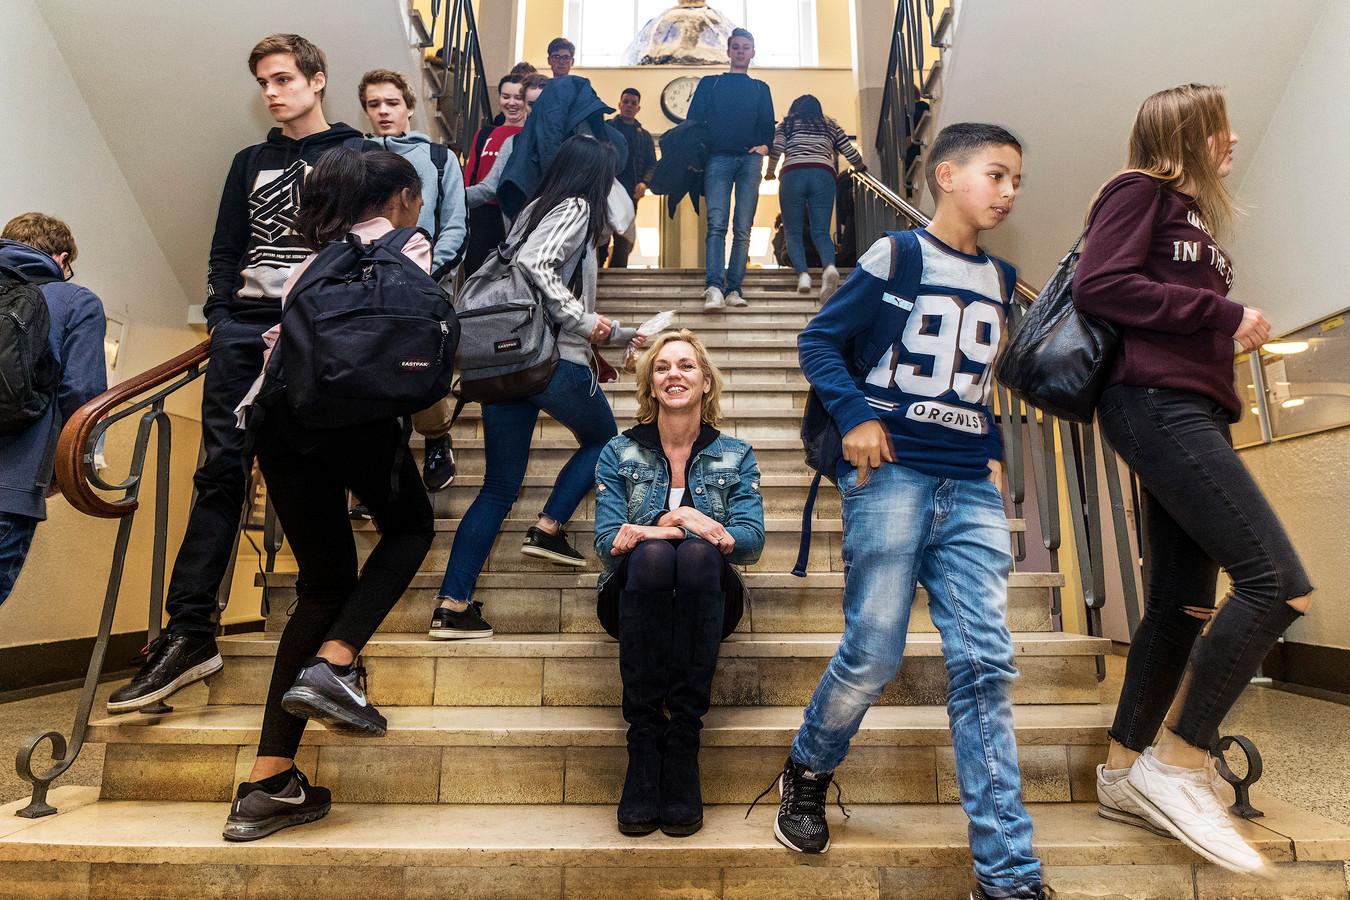 Nynke Gerritsma in de school